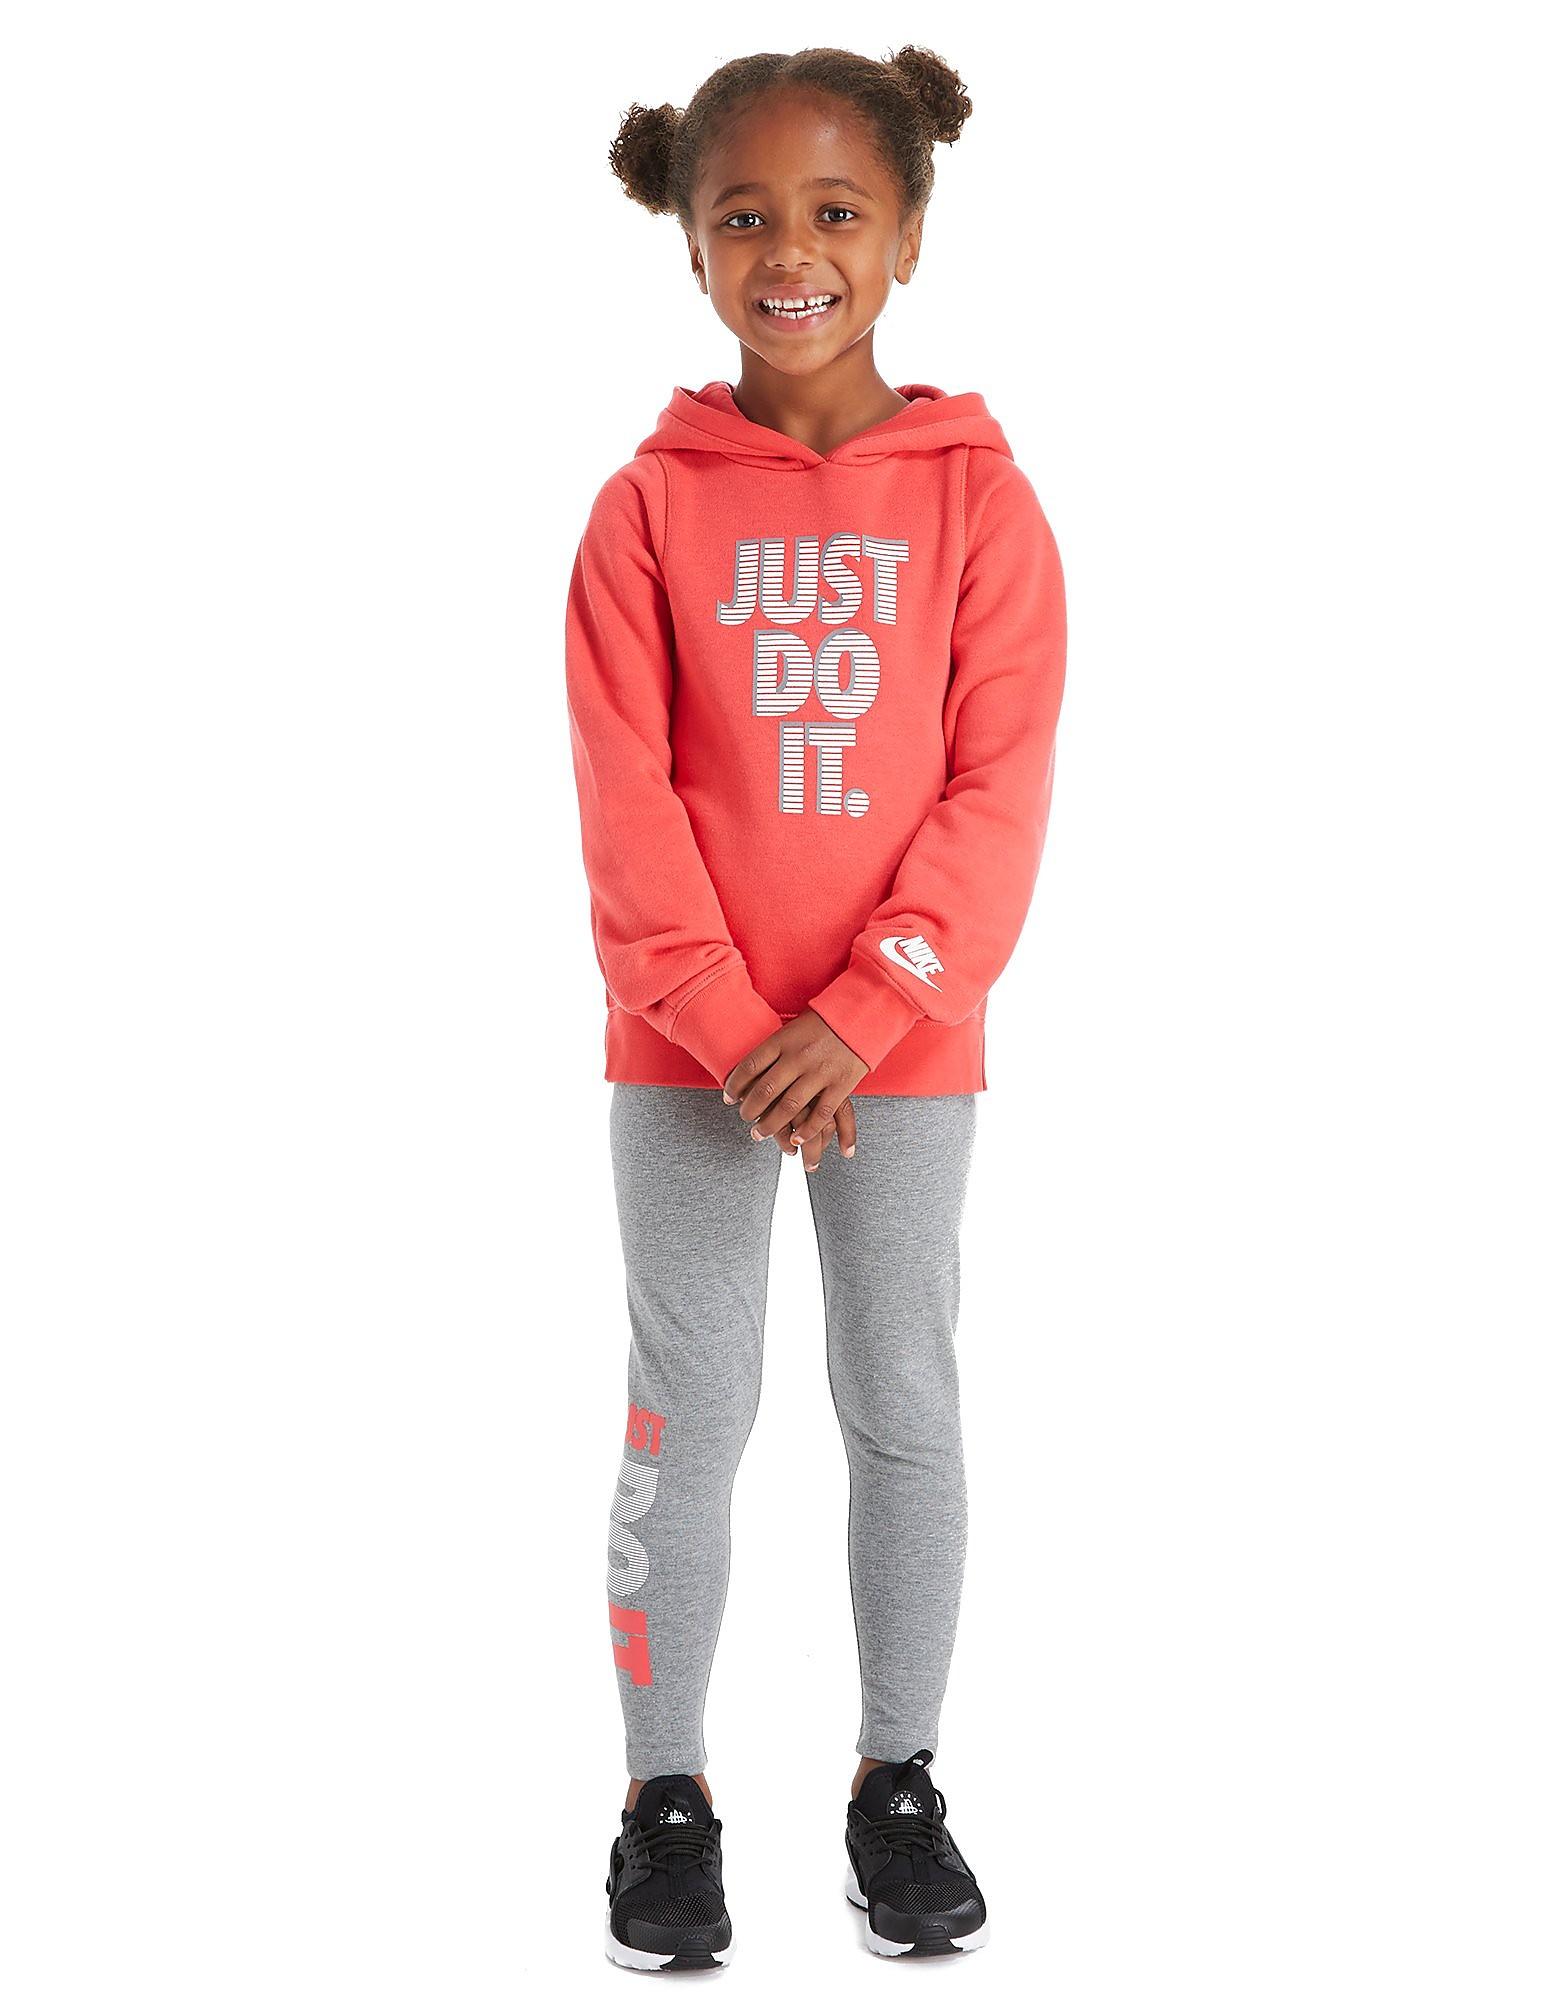 Nike Just Do It Hoody and Legging Set Girls